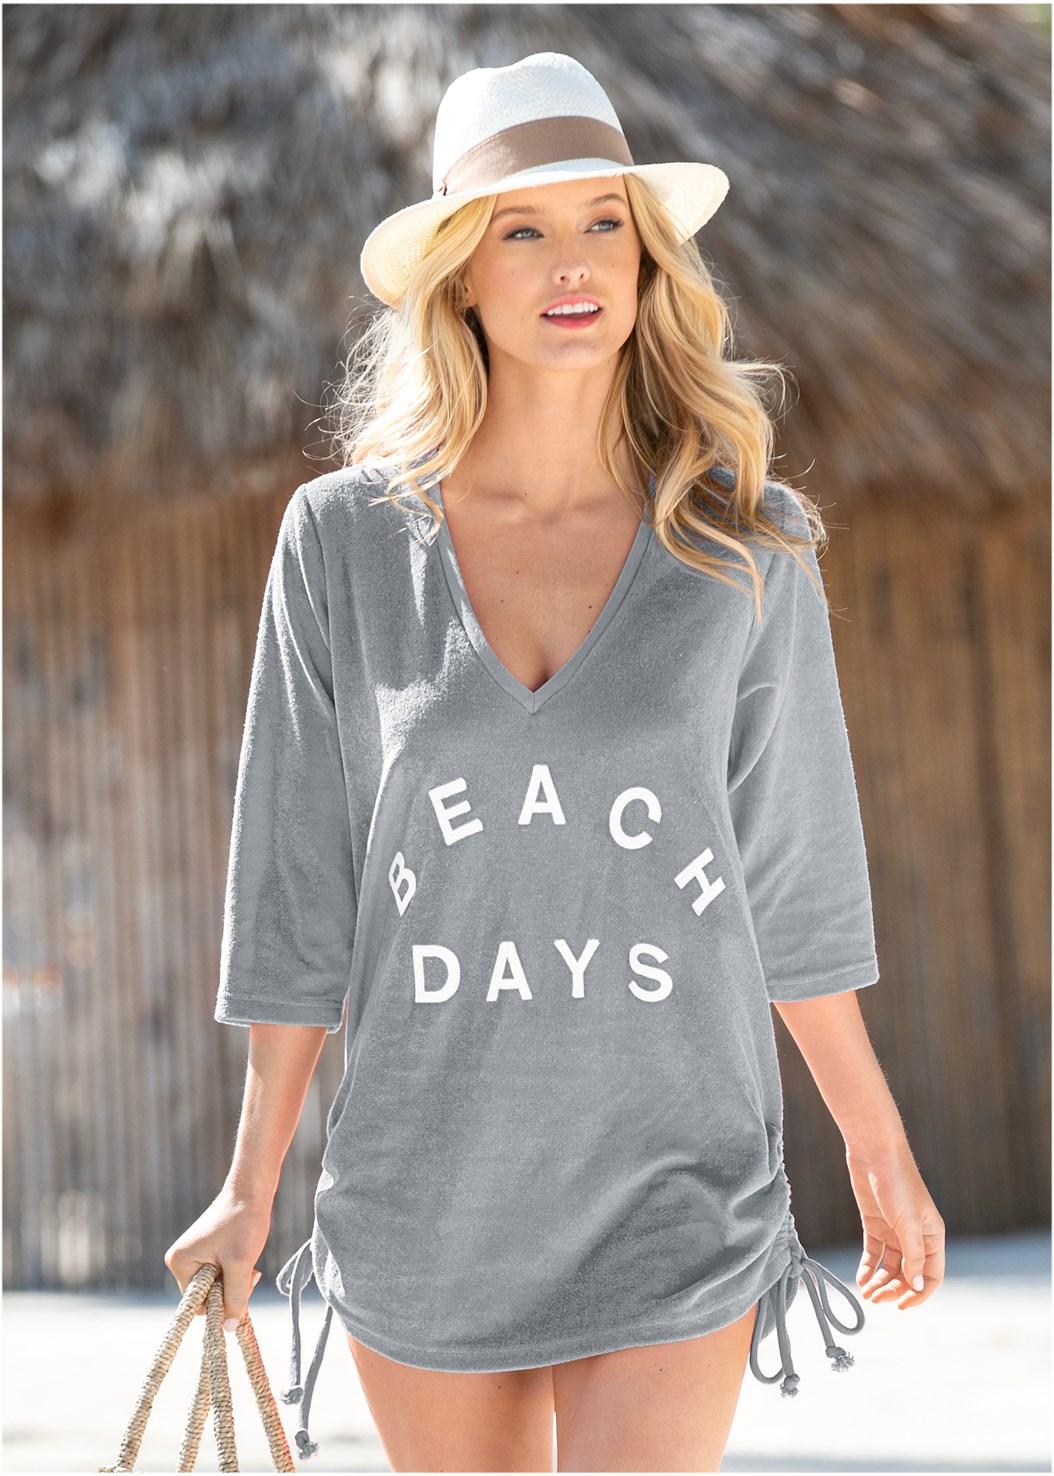 Deep V Beach Cover-Up,Beaded Crochet One-Piece